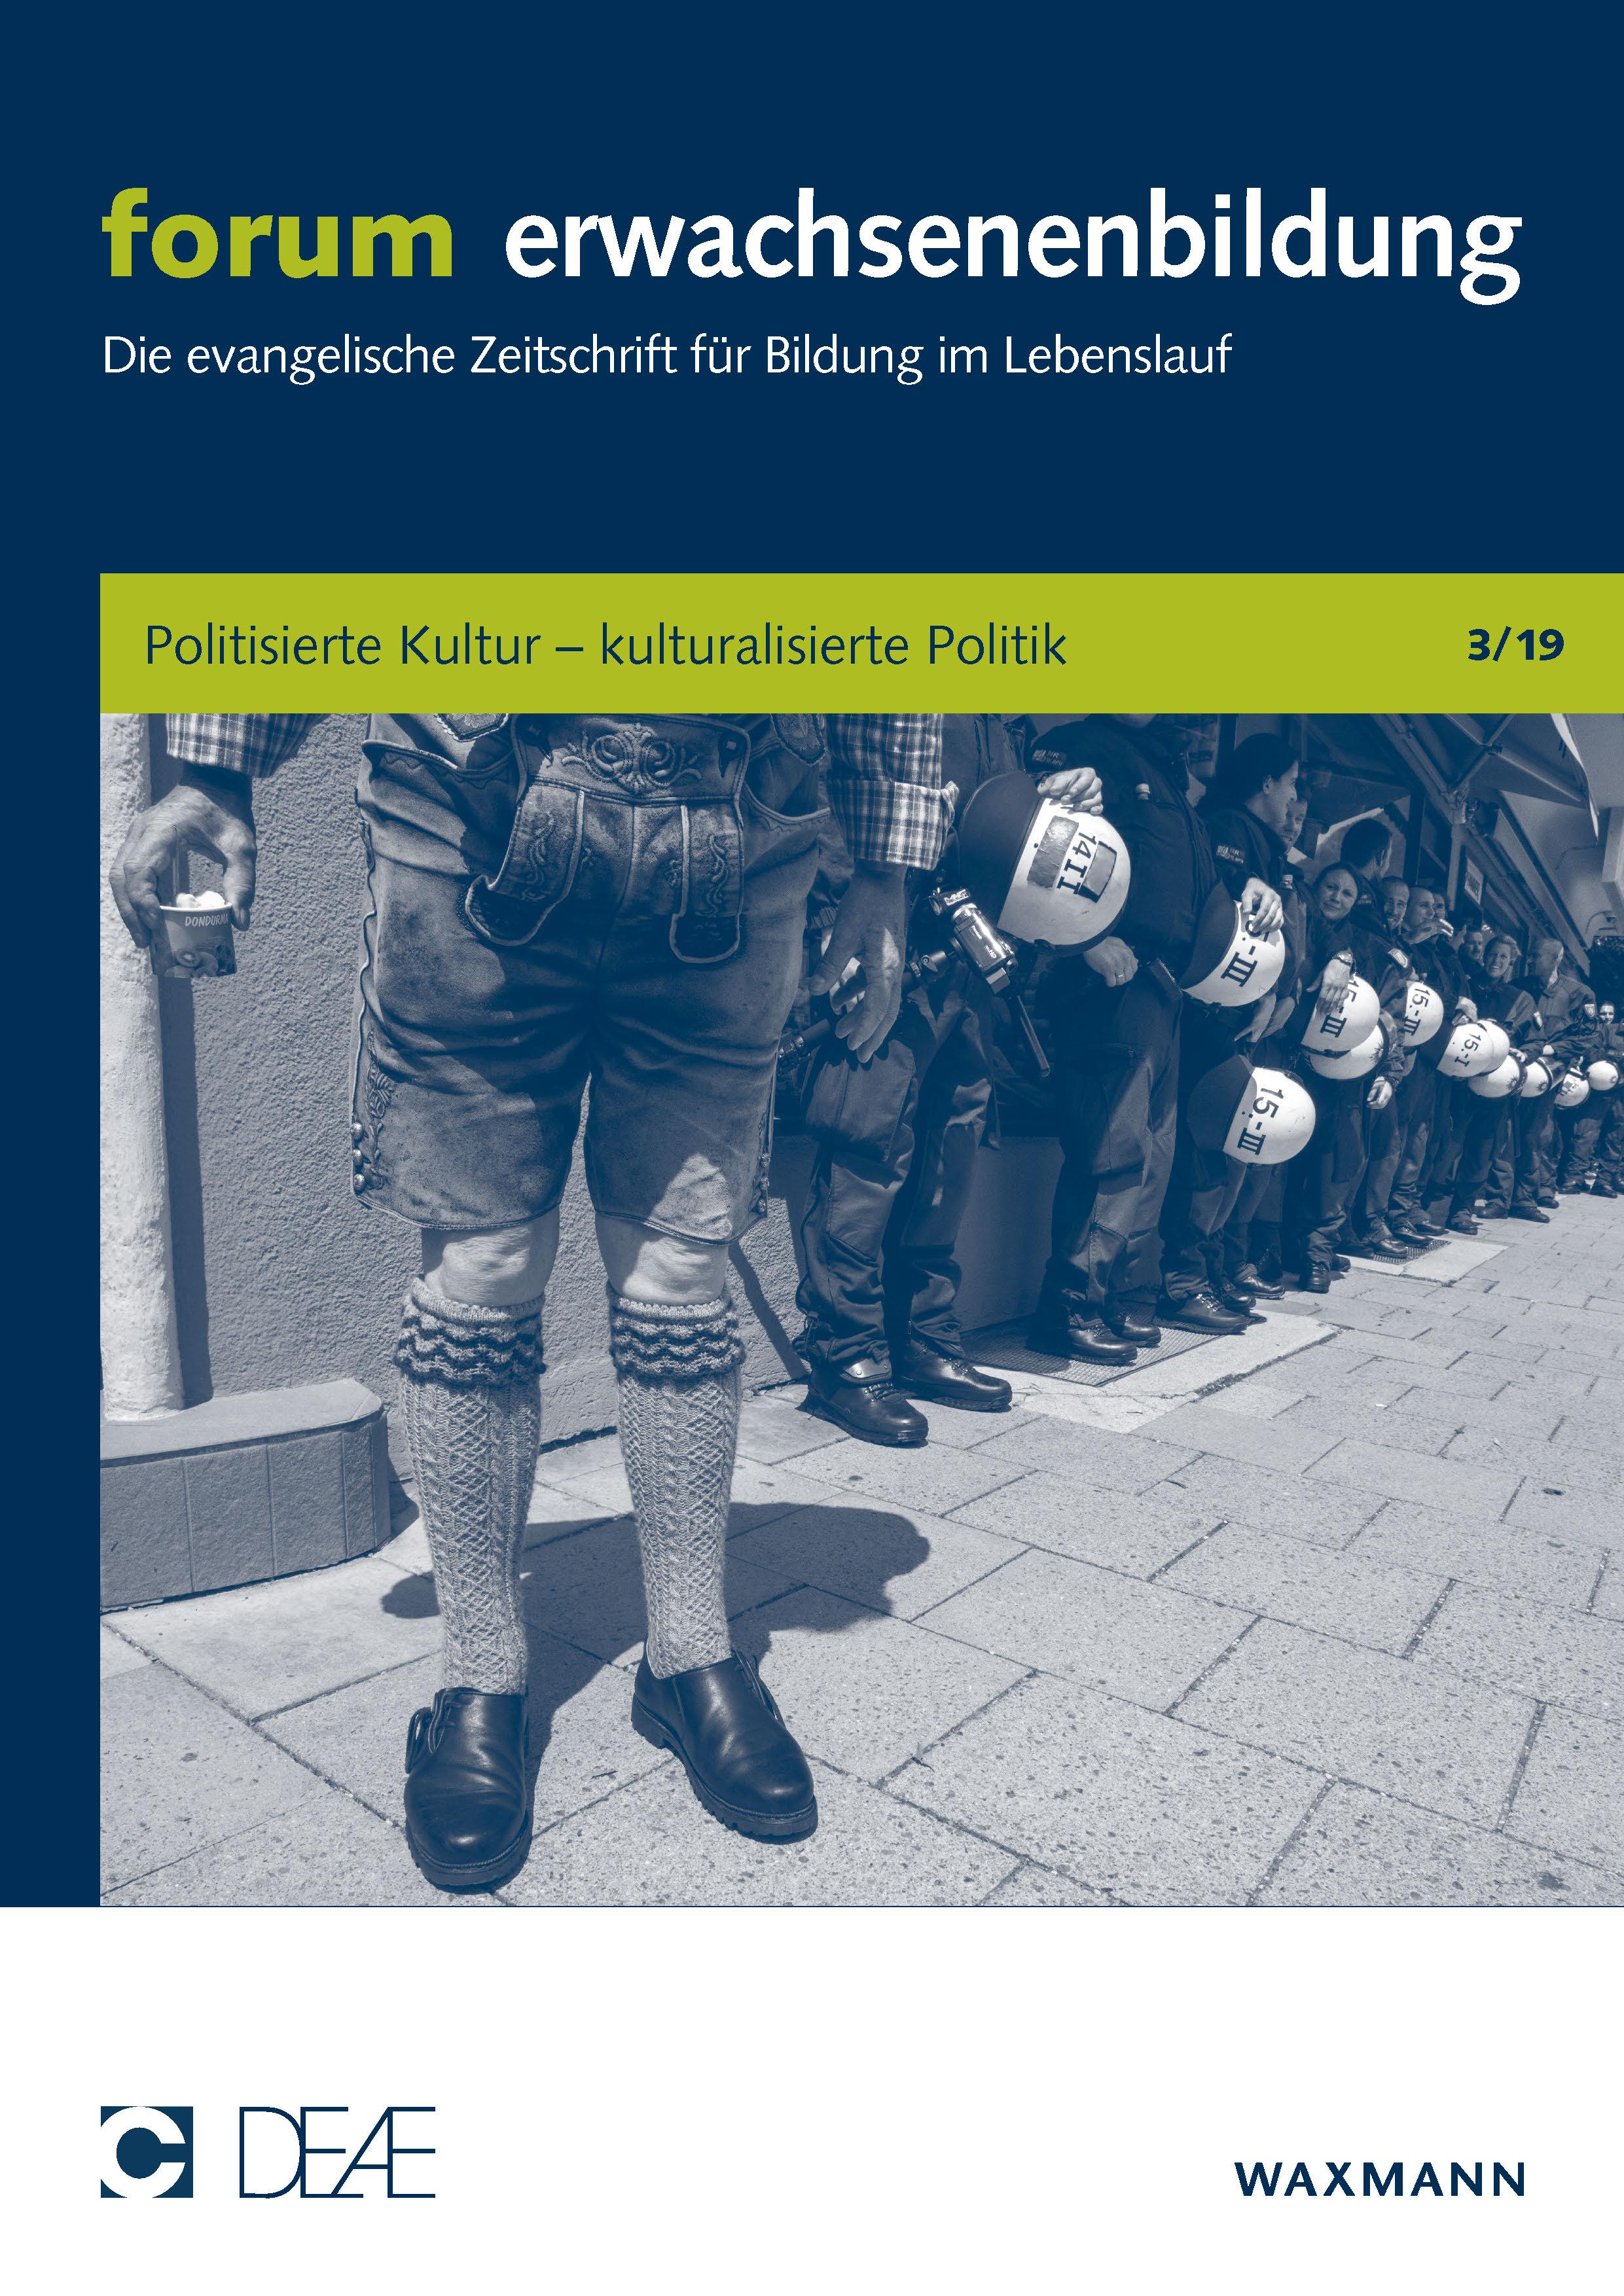 forum erwachsenenbildung: Politisierte Kultur – kulturalisierte Politik